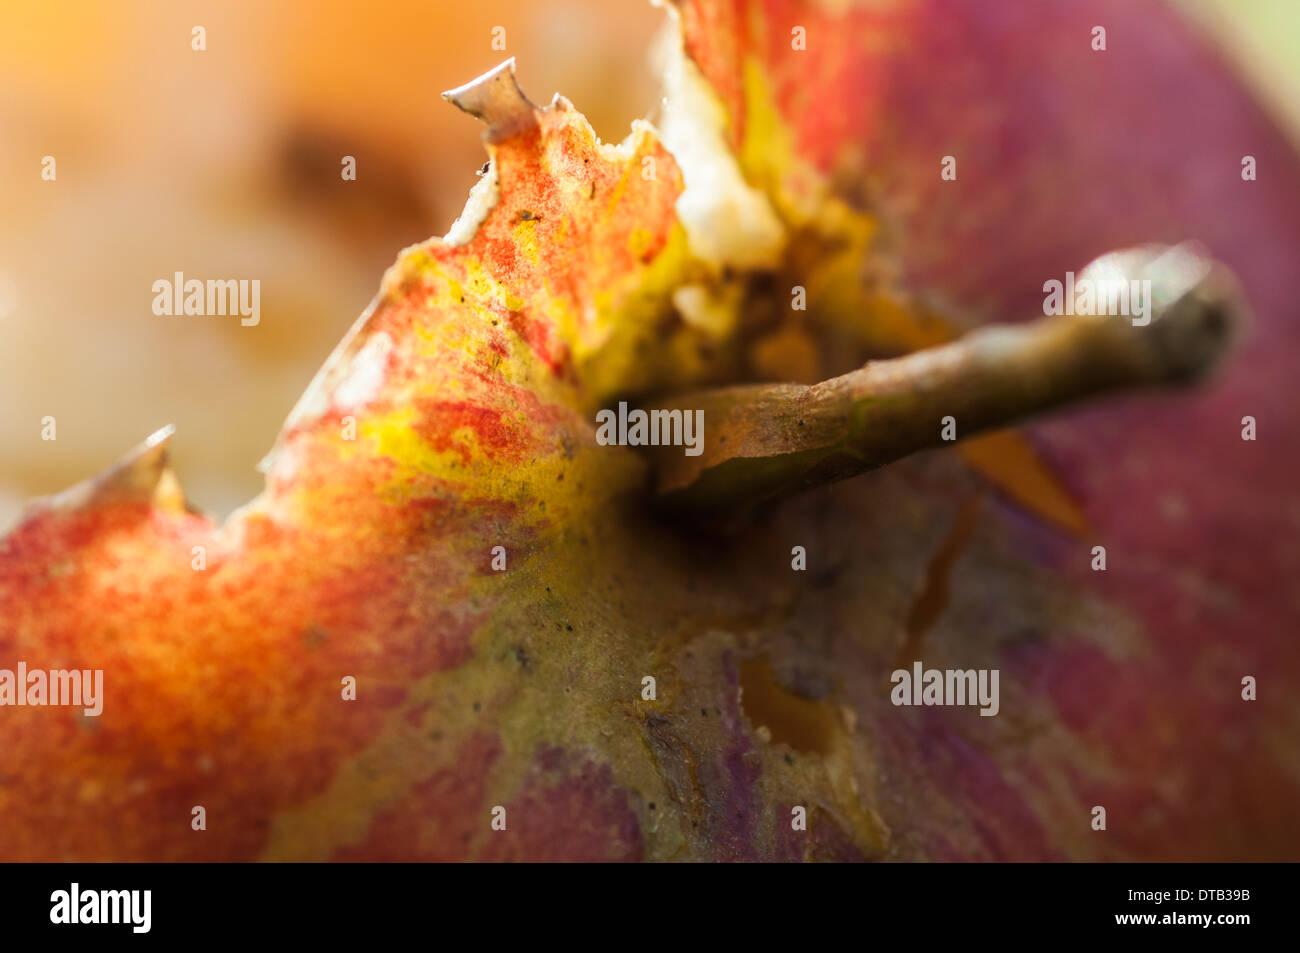 Closeup of a fallen apple that has been partially eaten by wildlife Stock Photo